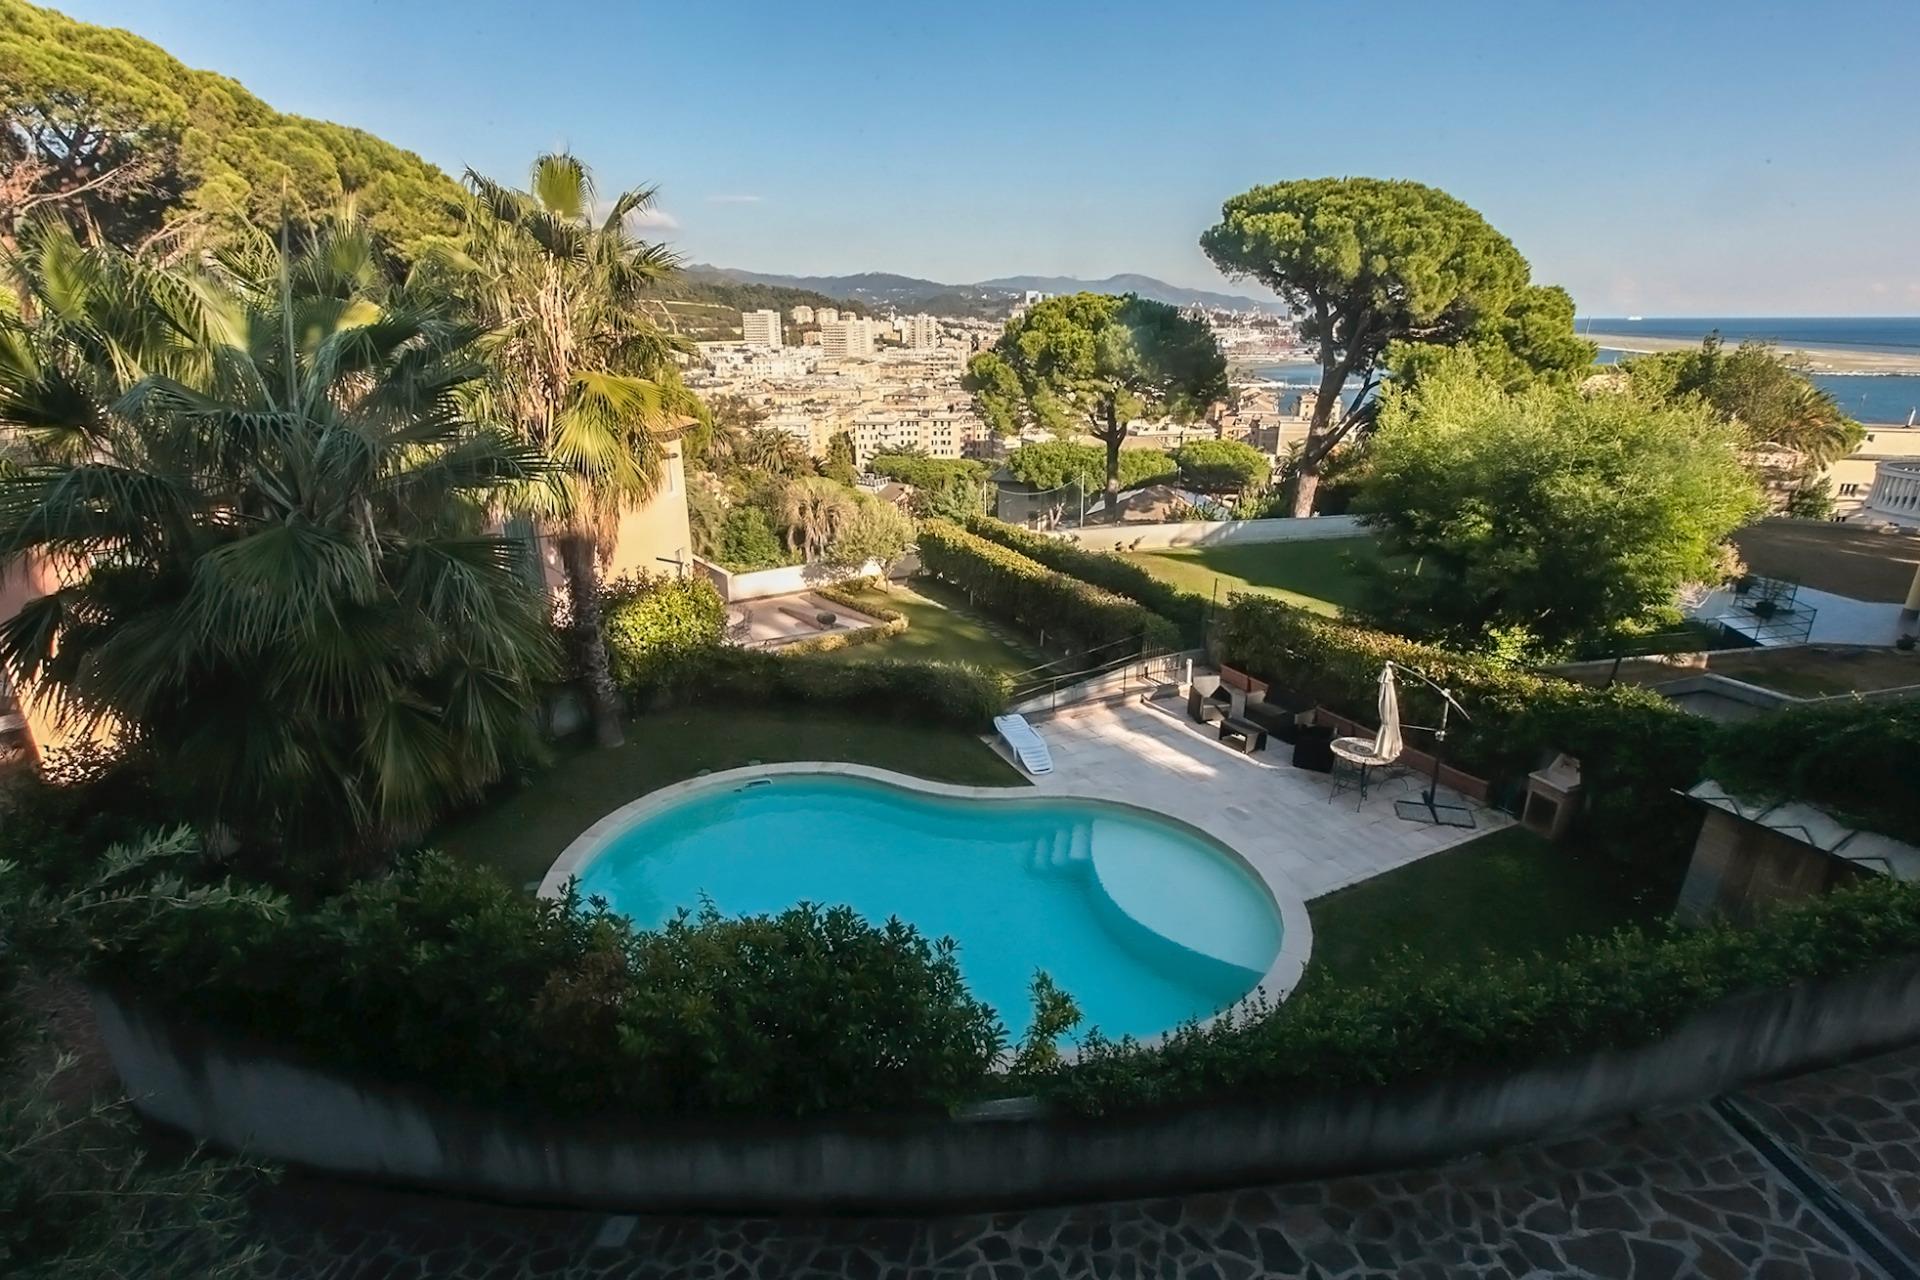 Villa con giardino a genova - Piscina rivarolo ...